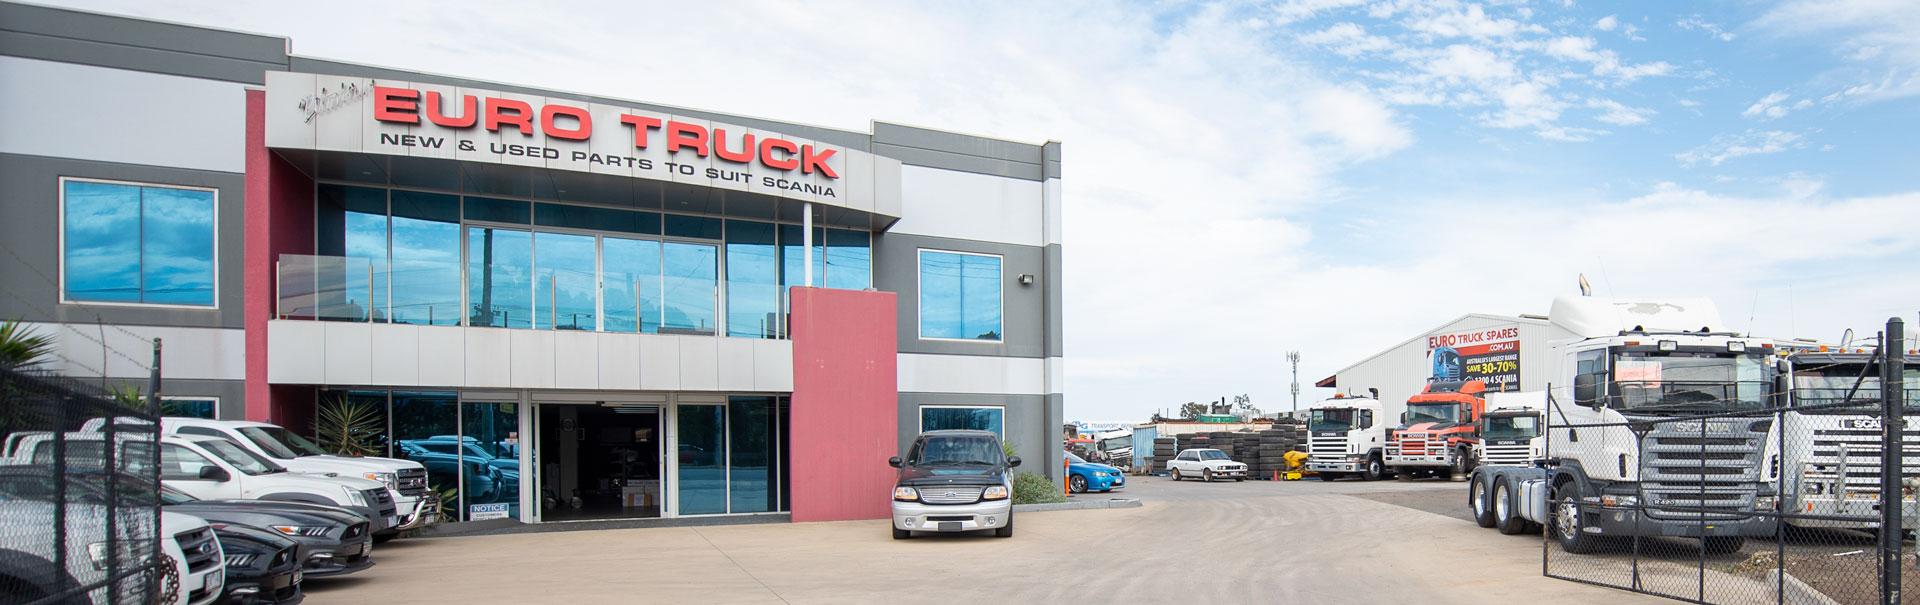 slider5 - euro trucks spares and repairs